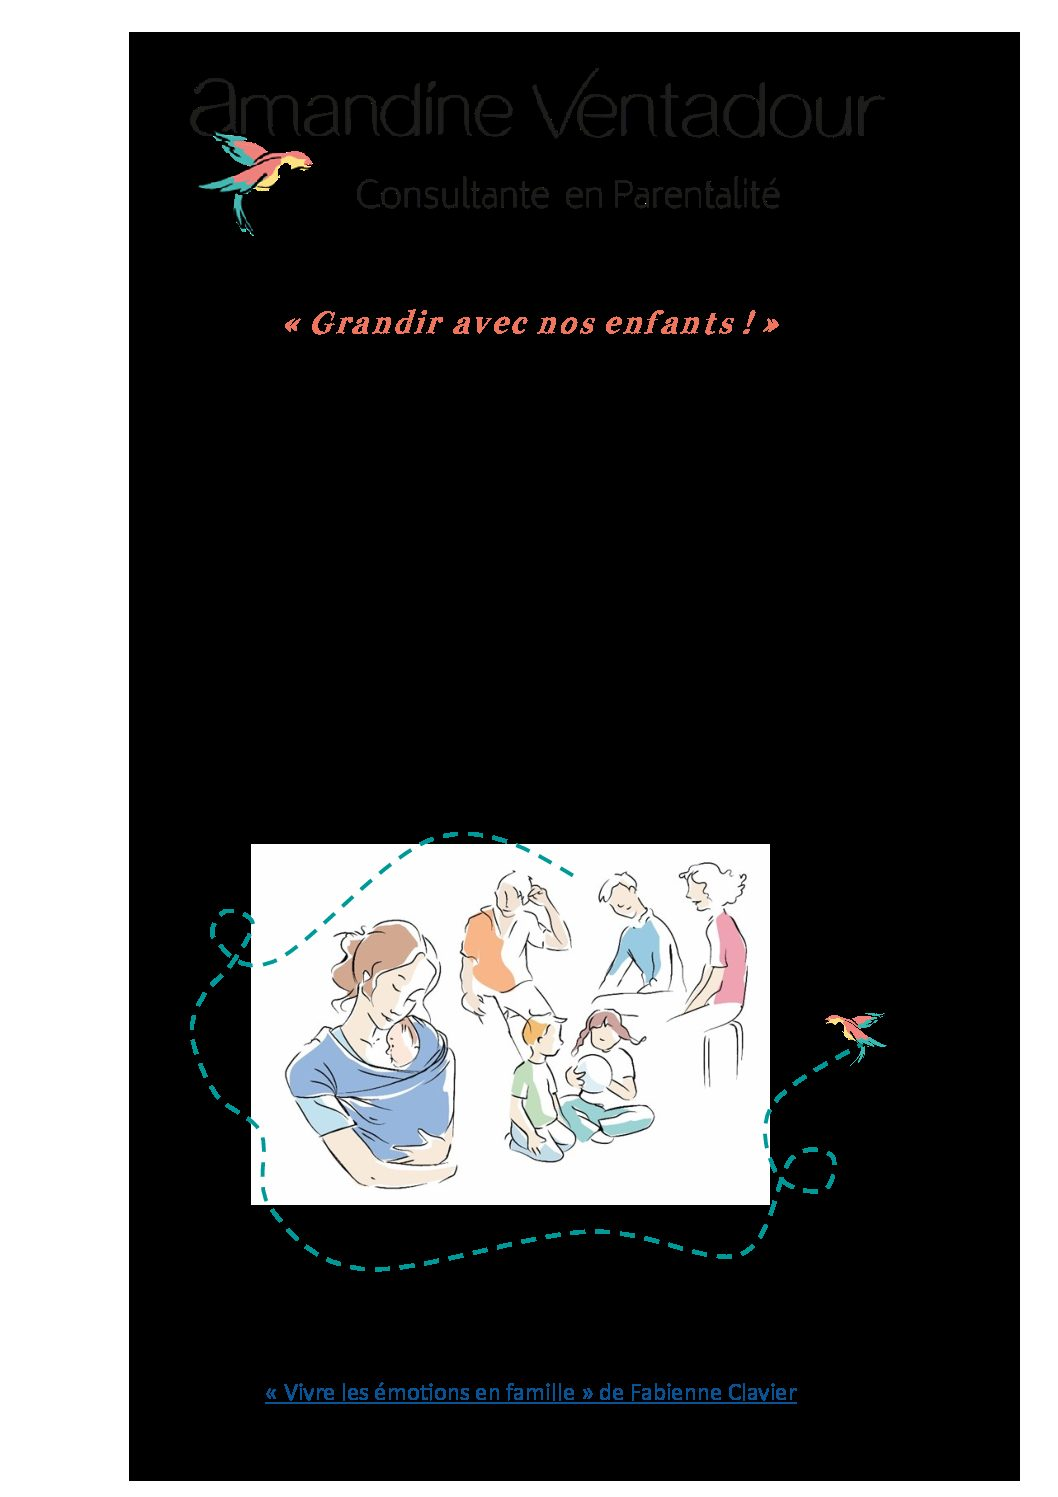 Amandine Ventadour consultante en parentalité - ebook reparer la relation